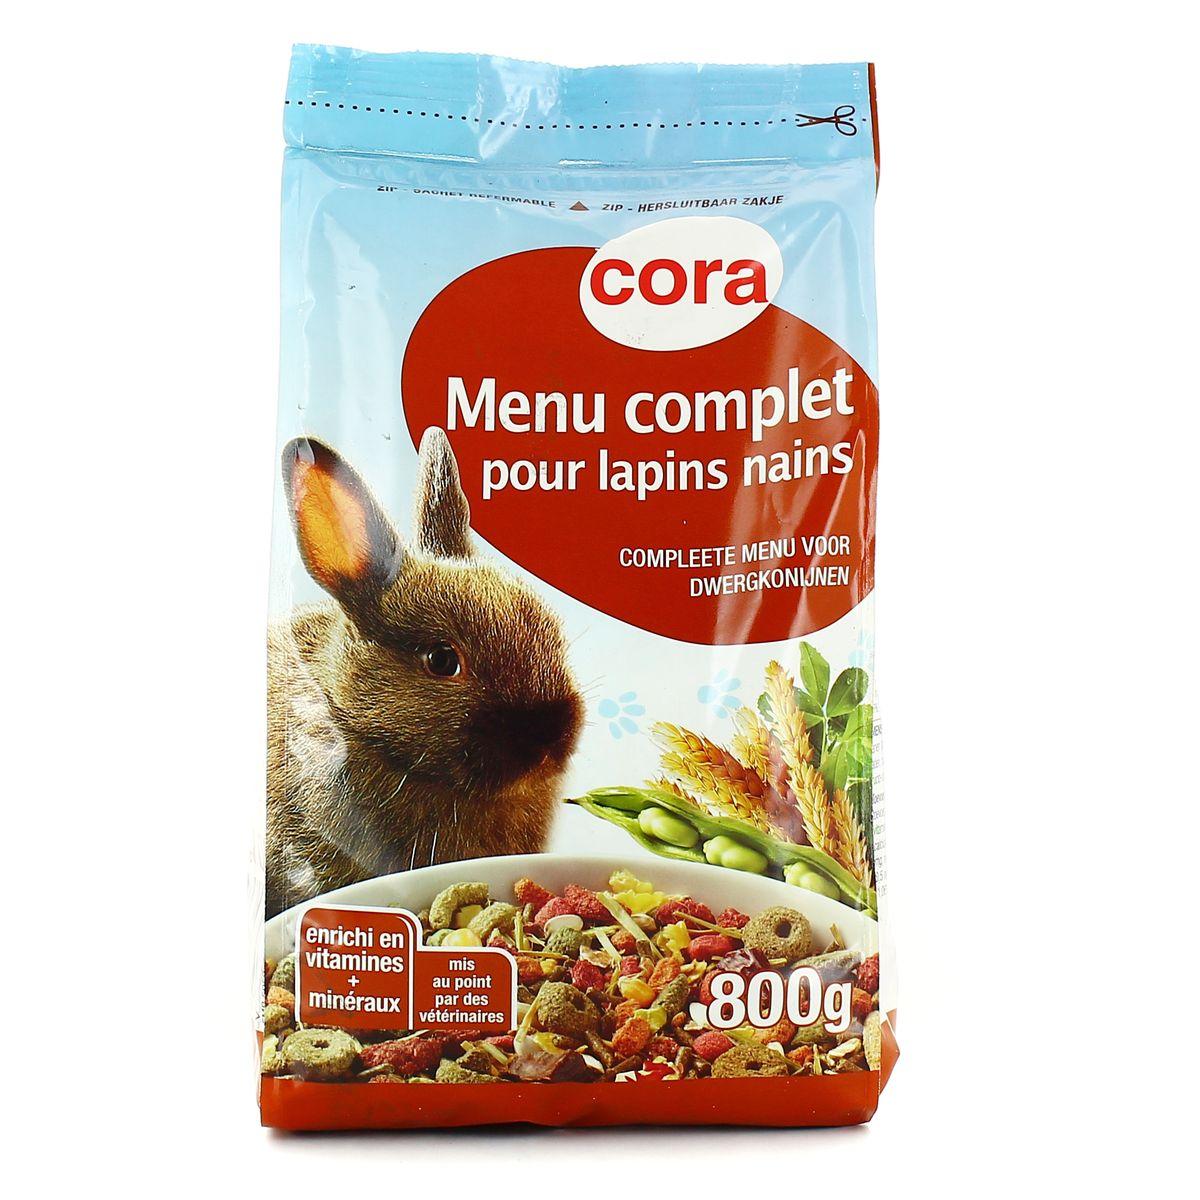 Cora Menu De Noel.Cora Menu Complet Pour Lapins Nains 800g